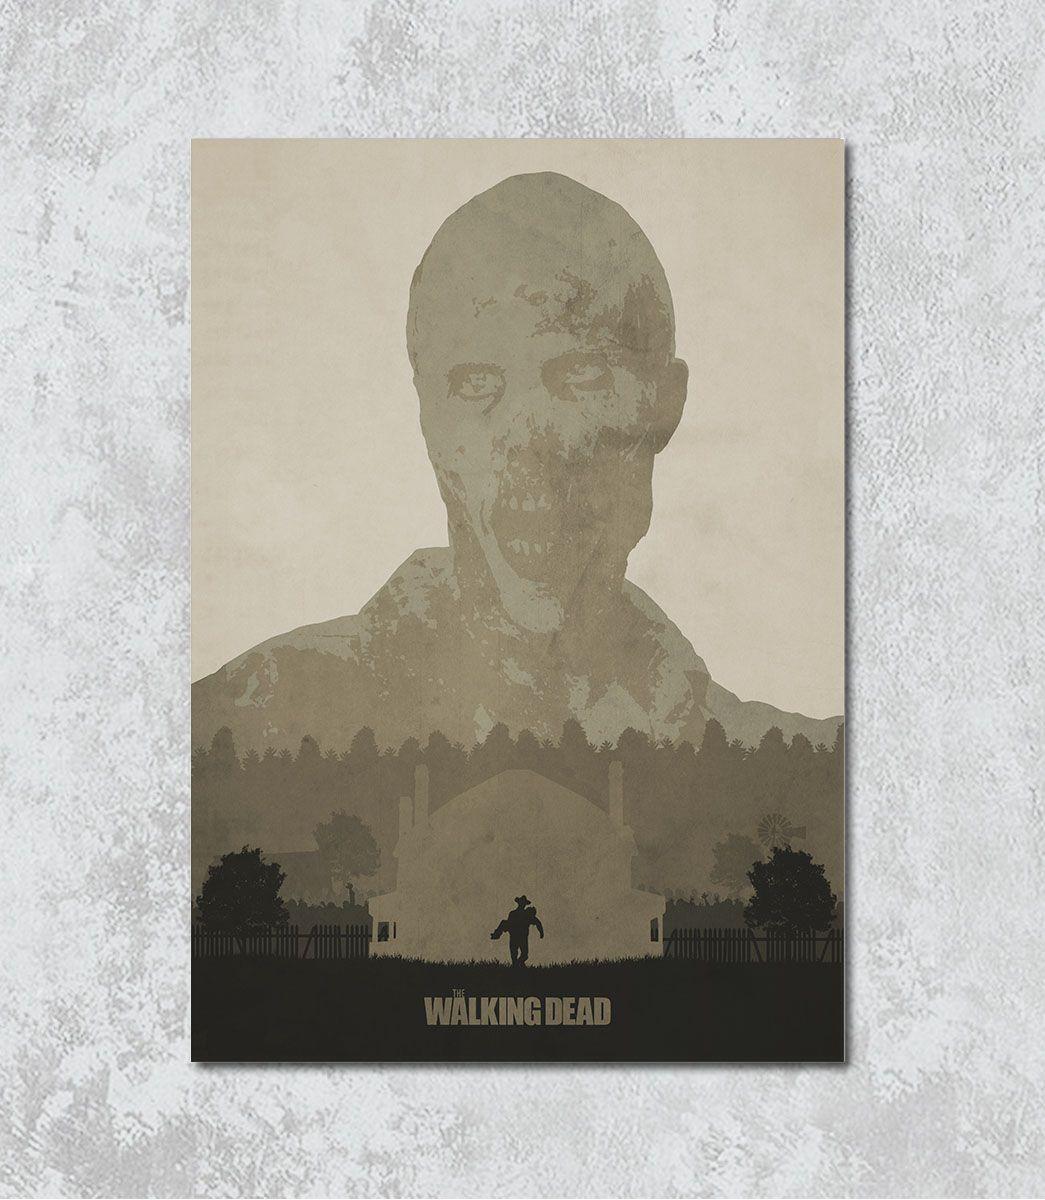 Decorativo - The Walking Dead 2